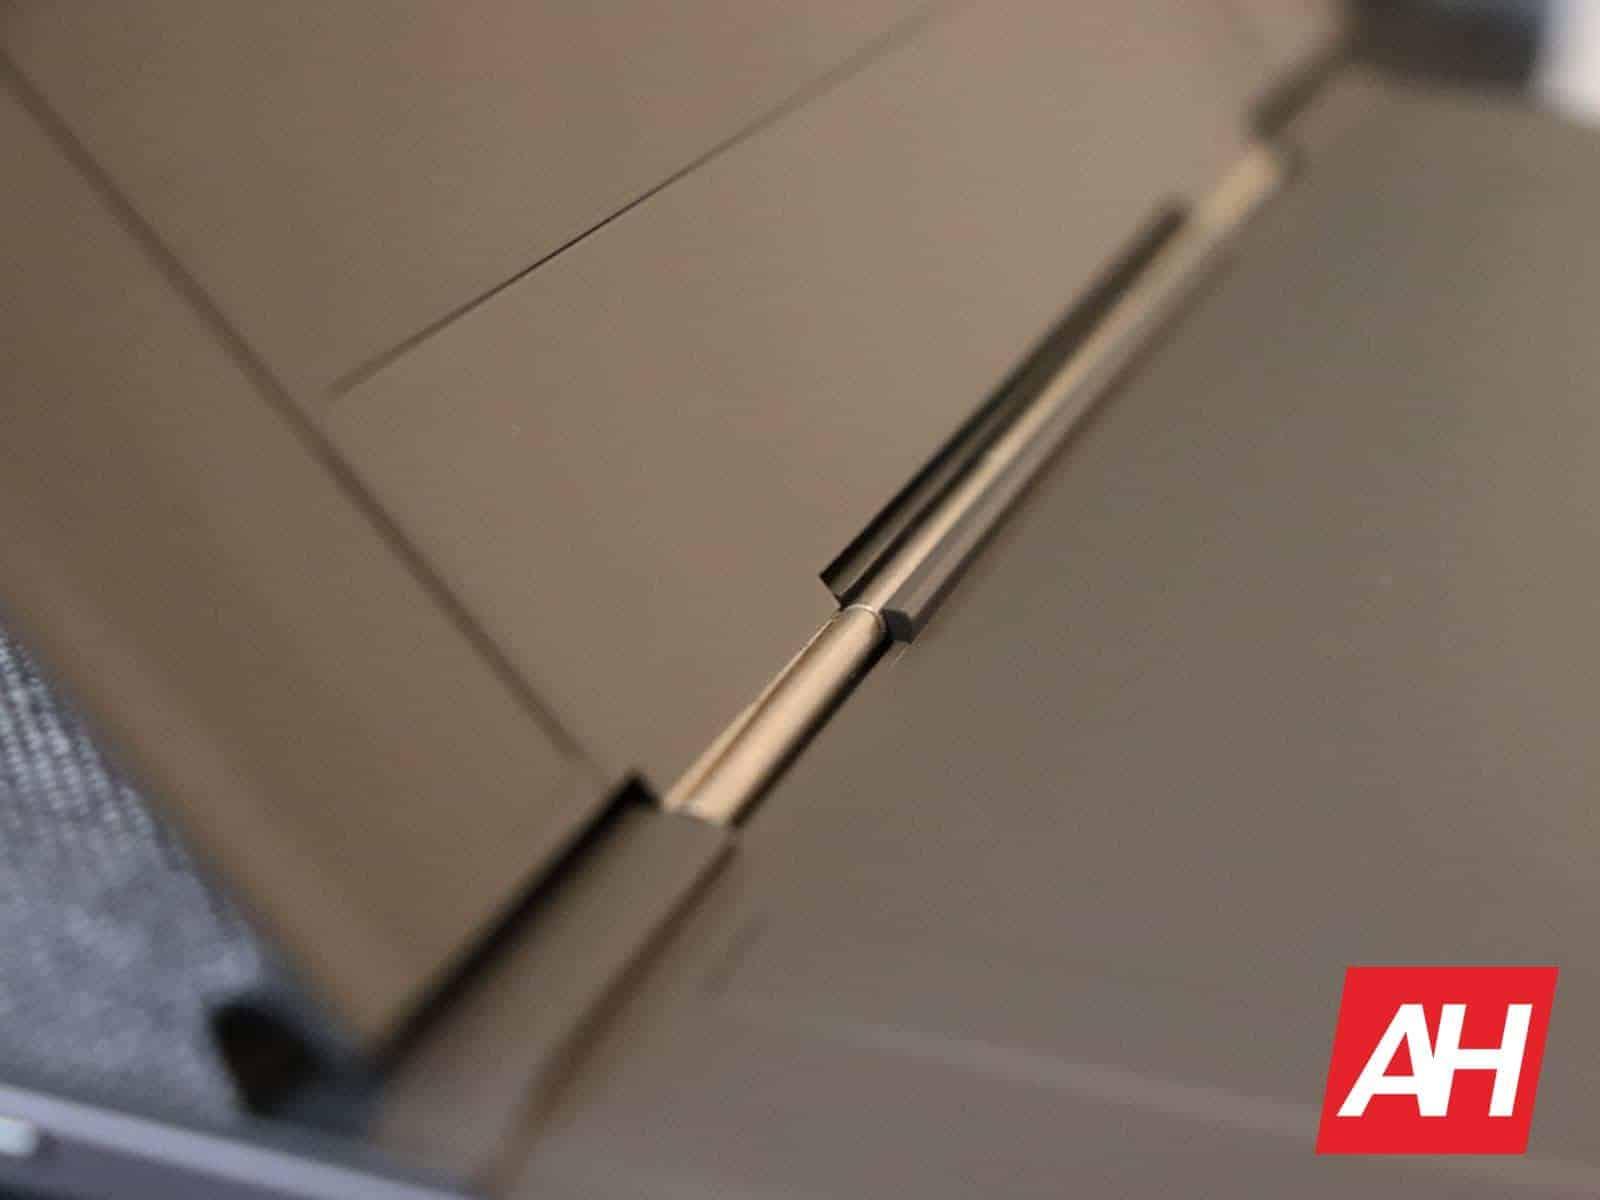 04 4 Lenovo IdeaPad Duet Hardware AH 2020